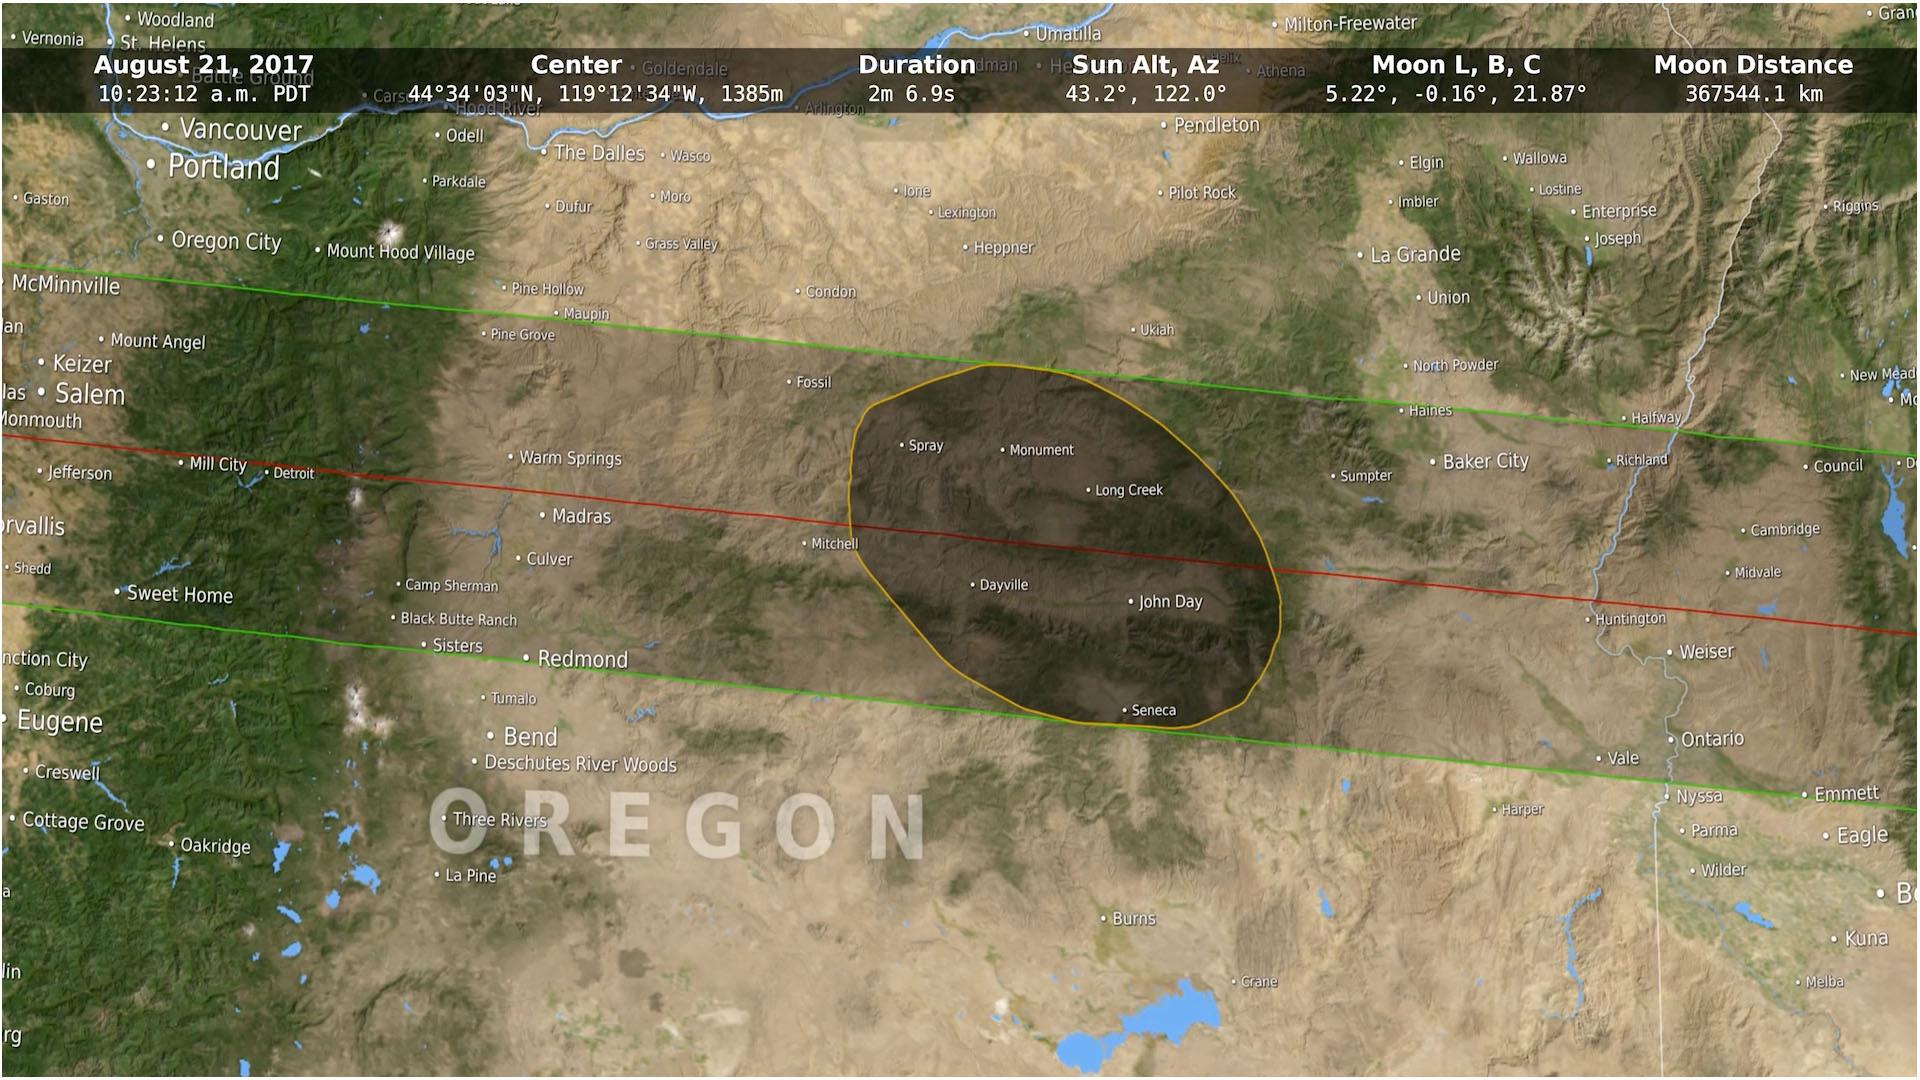 Svs umbra shapes tracing the 2017 solar eclipse publicscrutiny Images